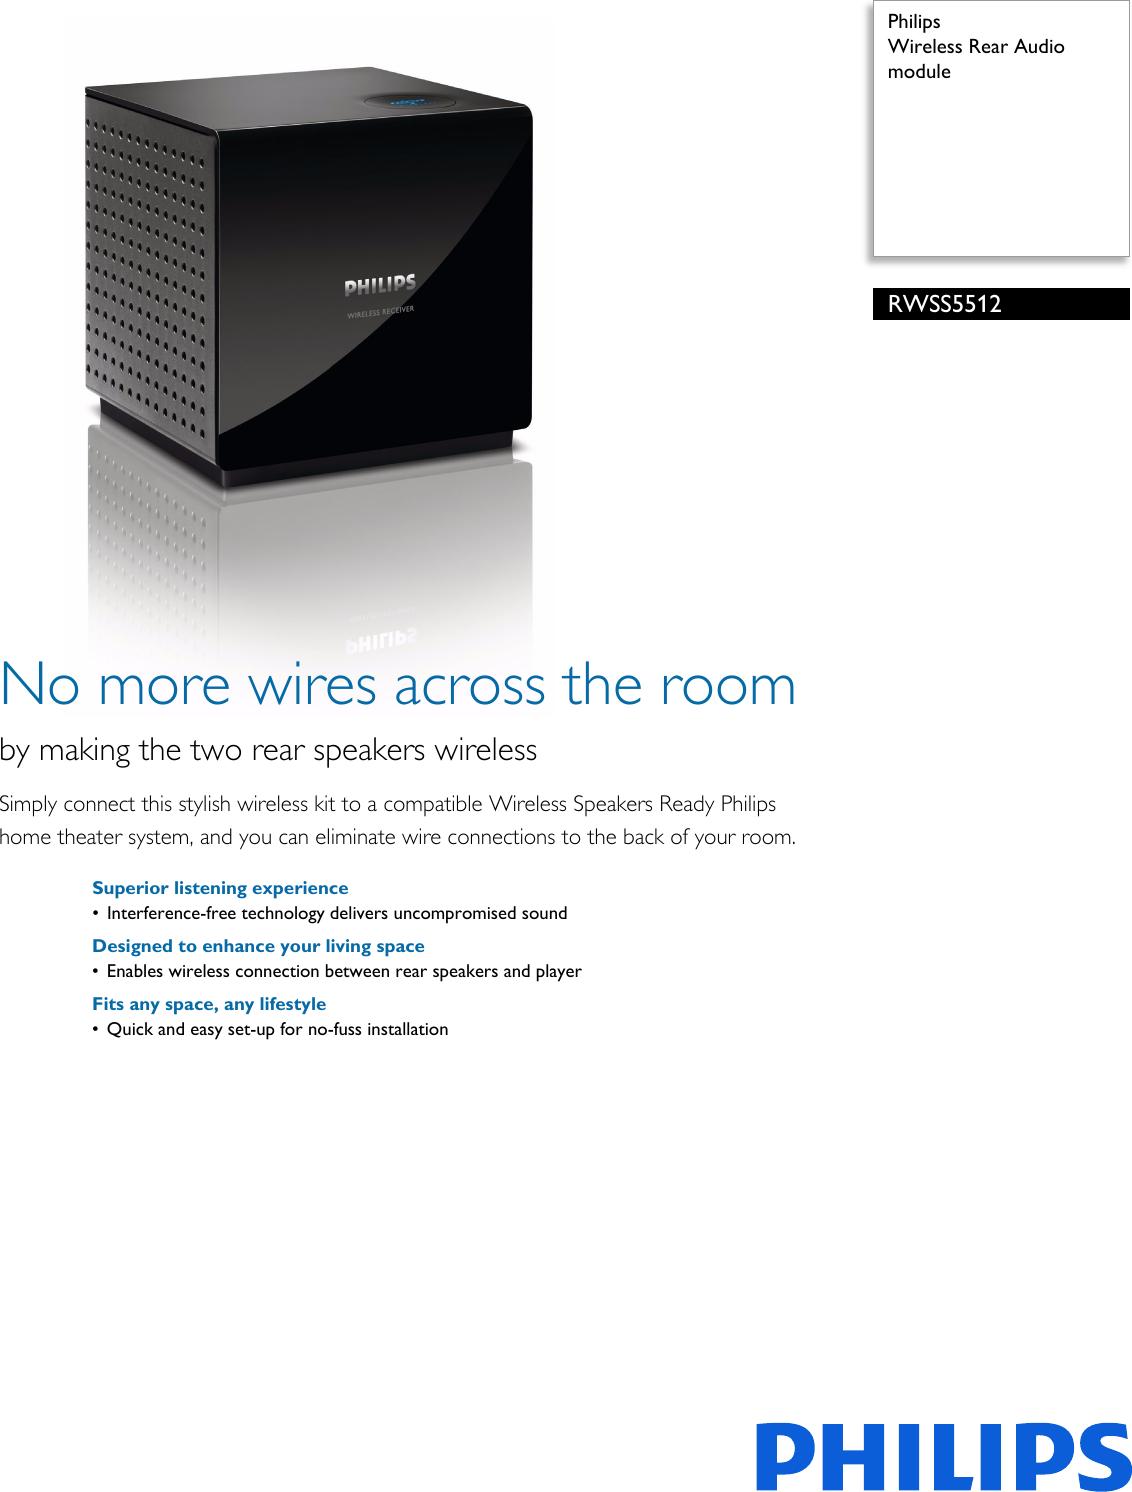 Philips RWSS5512/00 Wireless Rear Audio Module User Manual